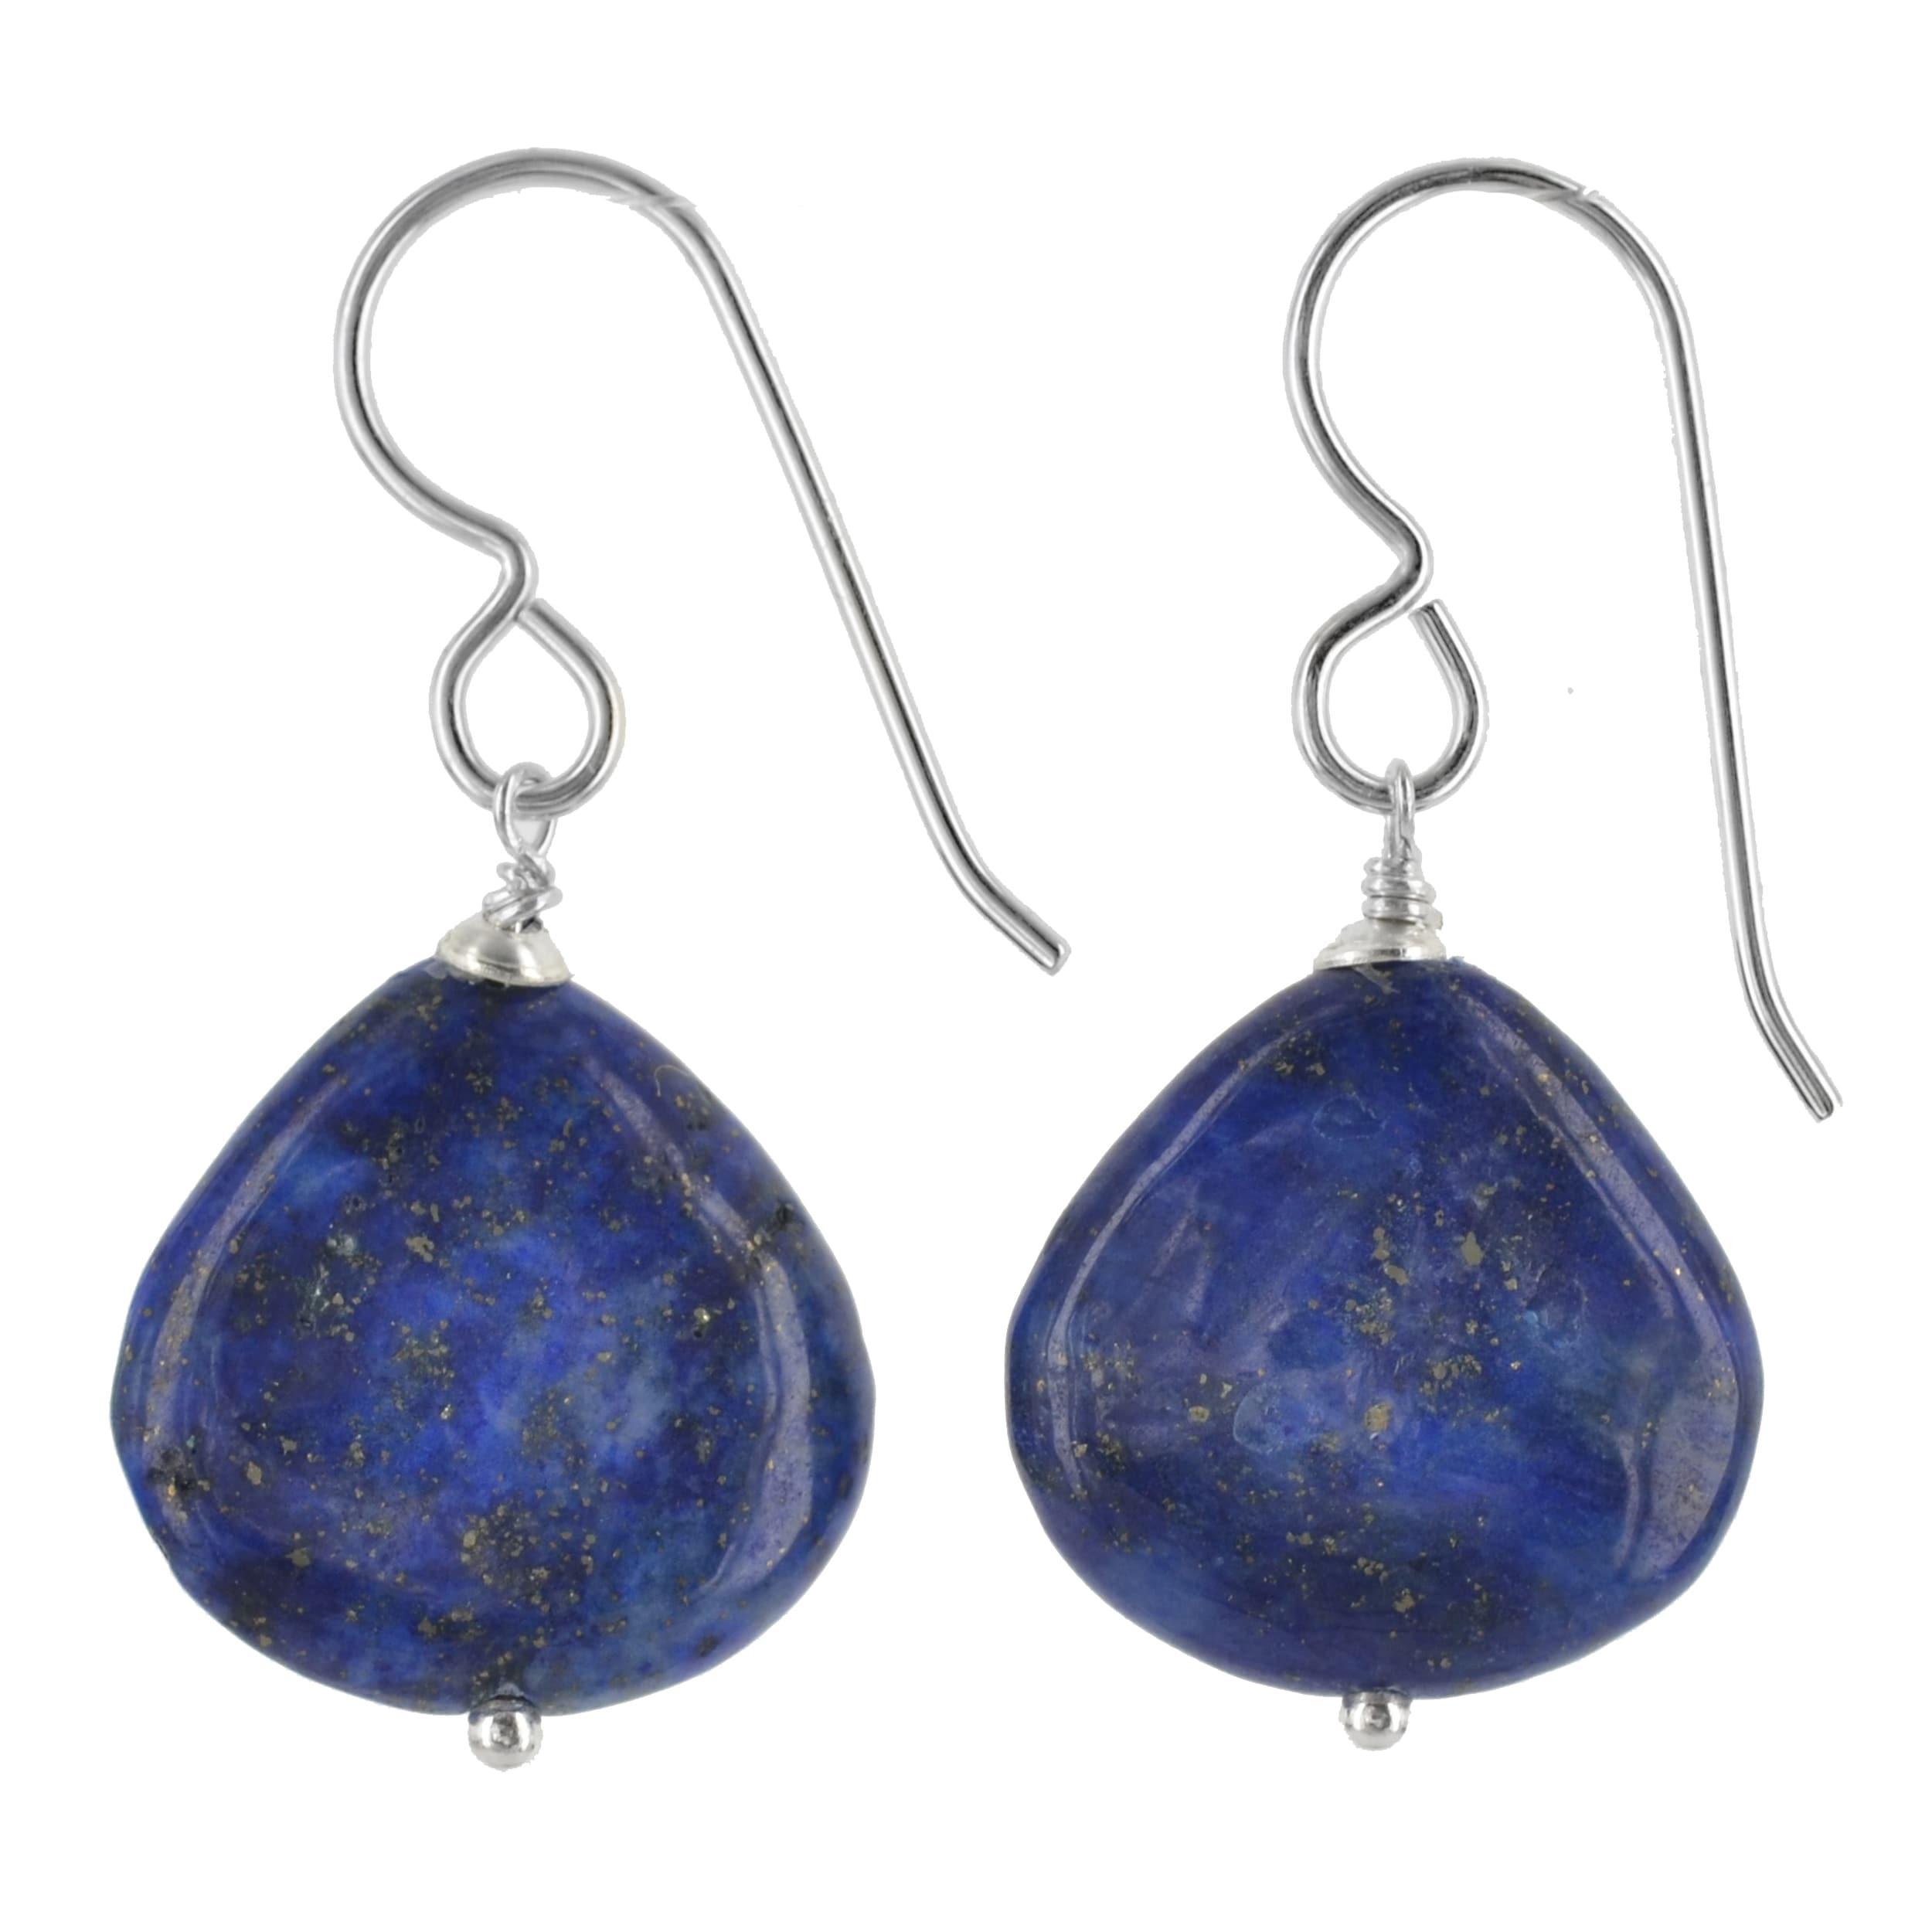 Lapis Lazuli Gemstone/Earring